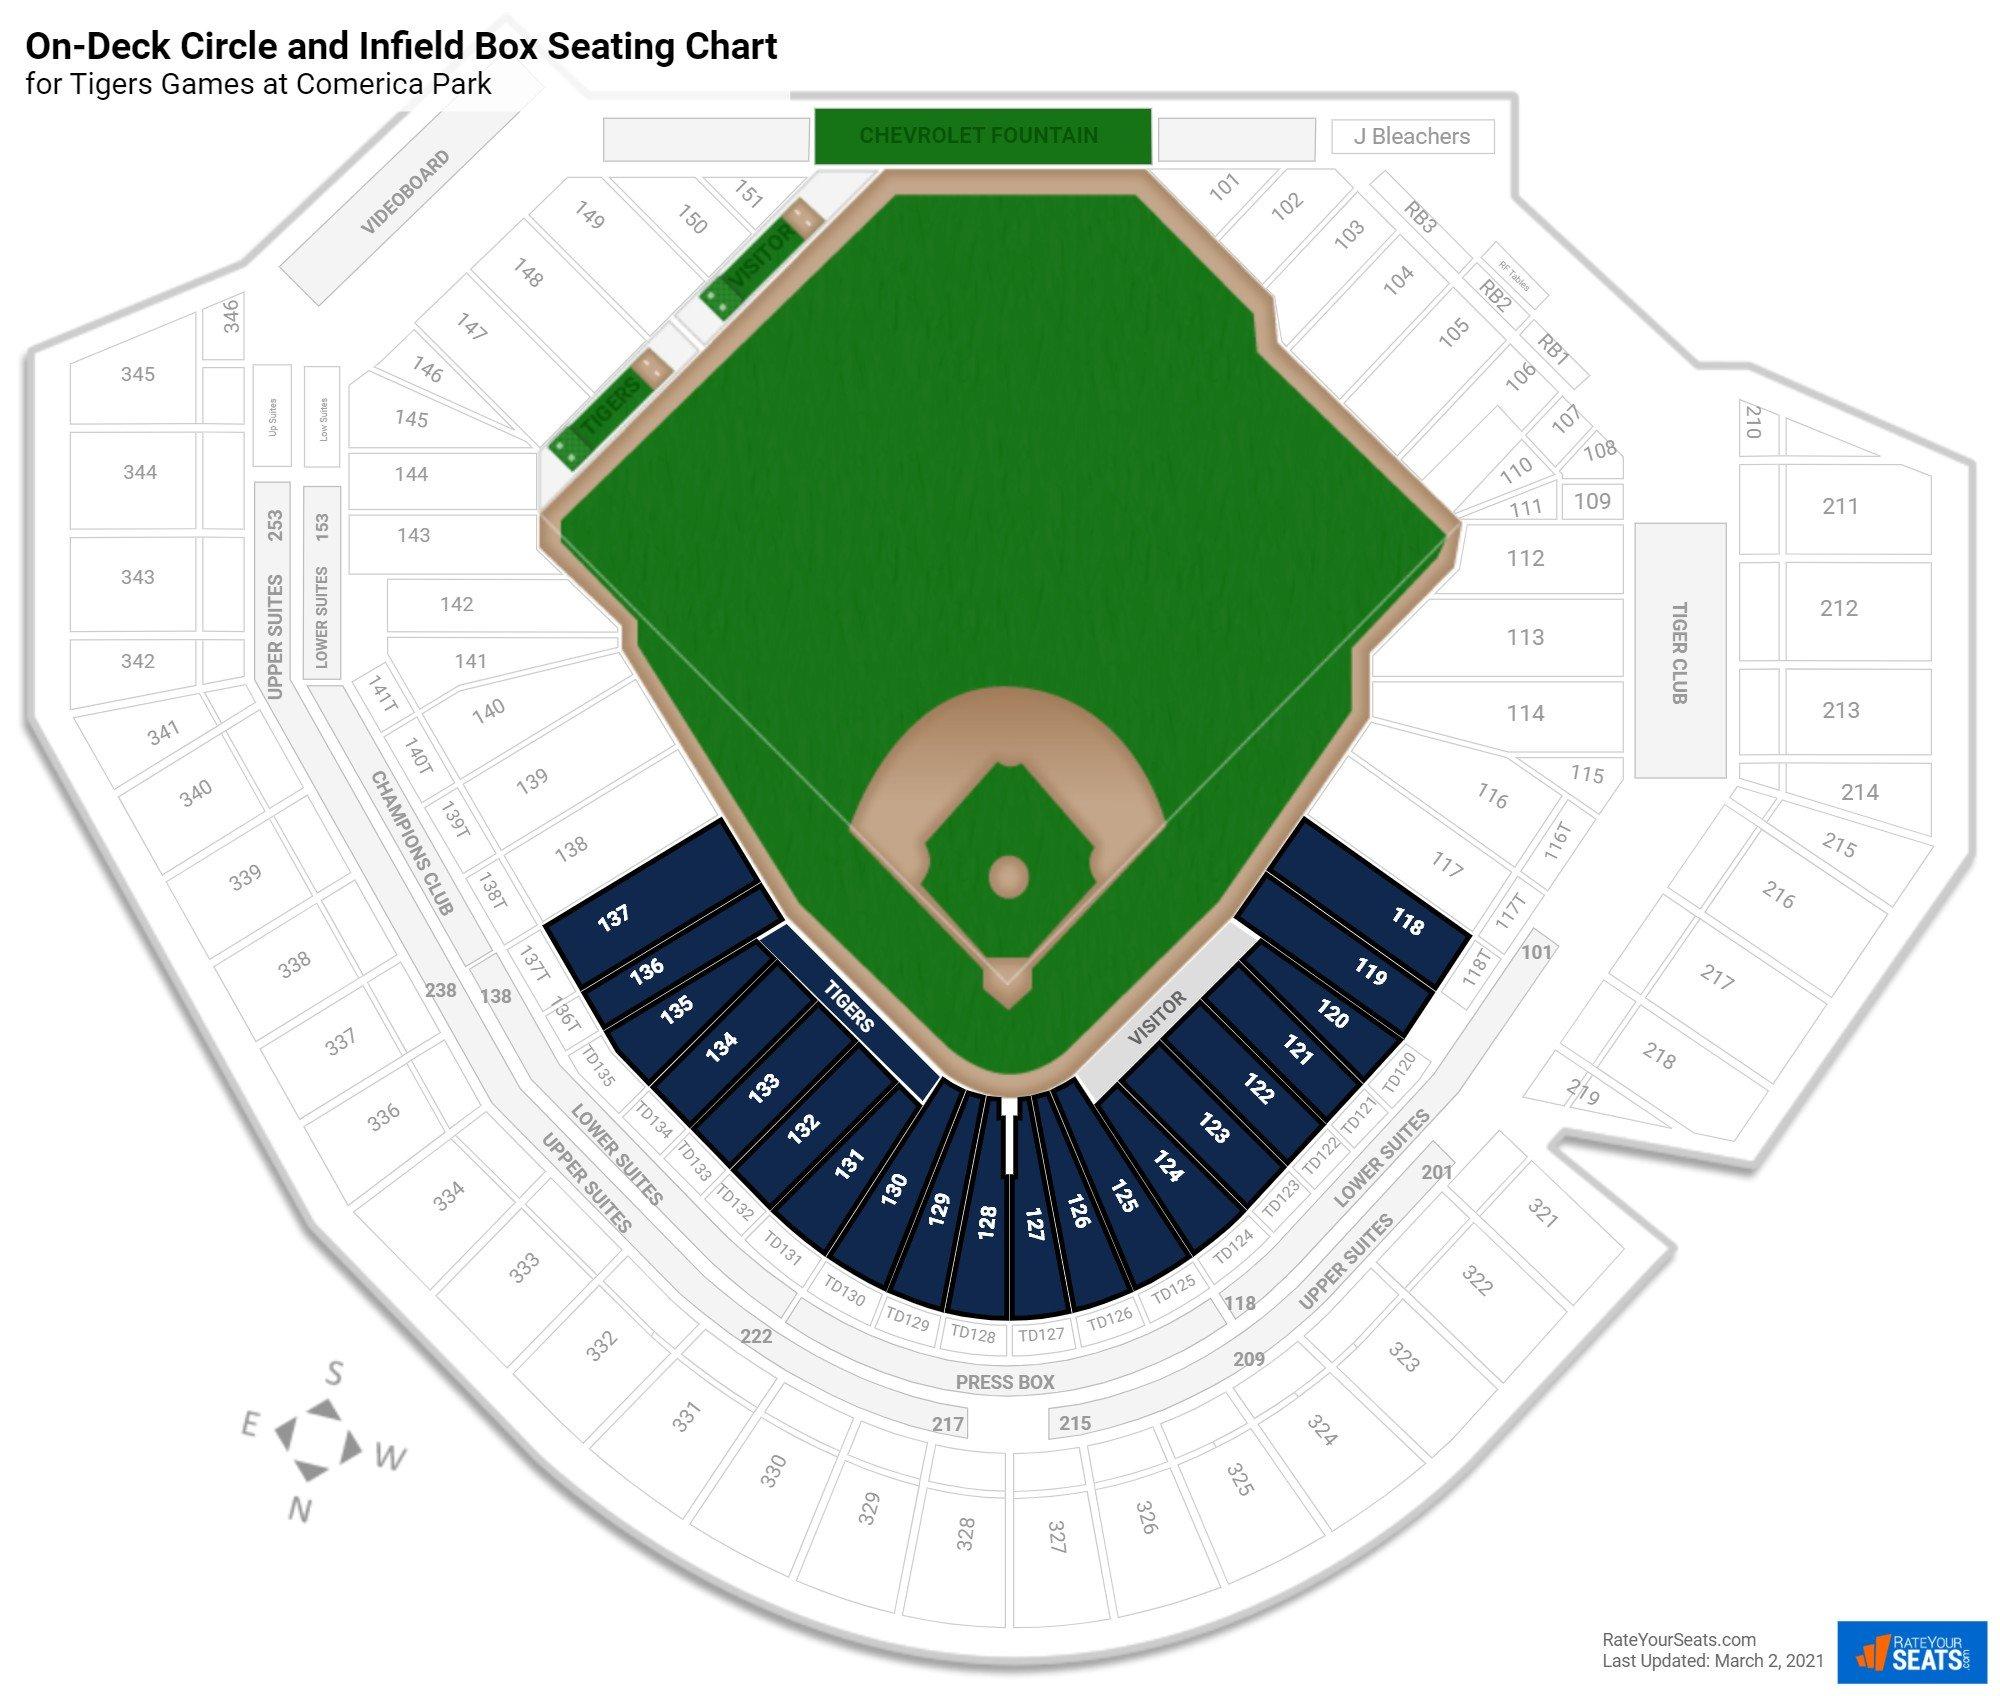 Comerica Park Tiger Den - Baseball Seating - RateYourSeats.com